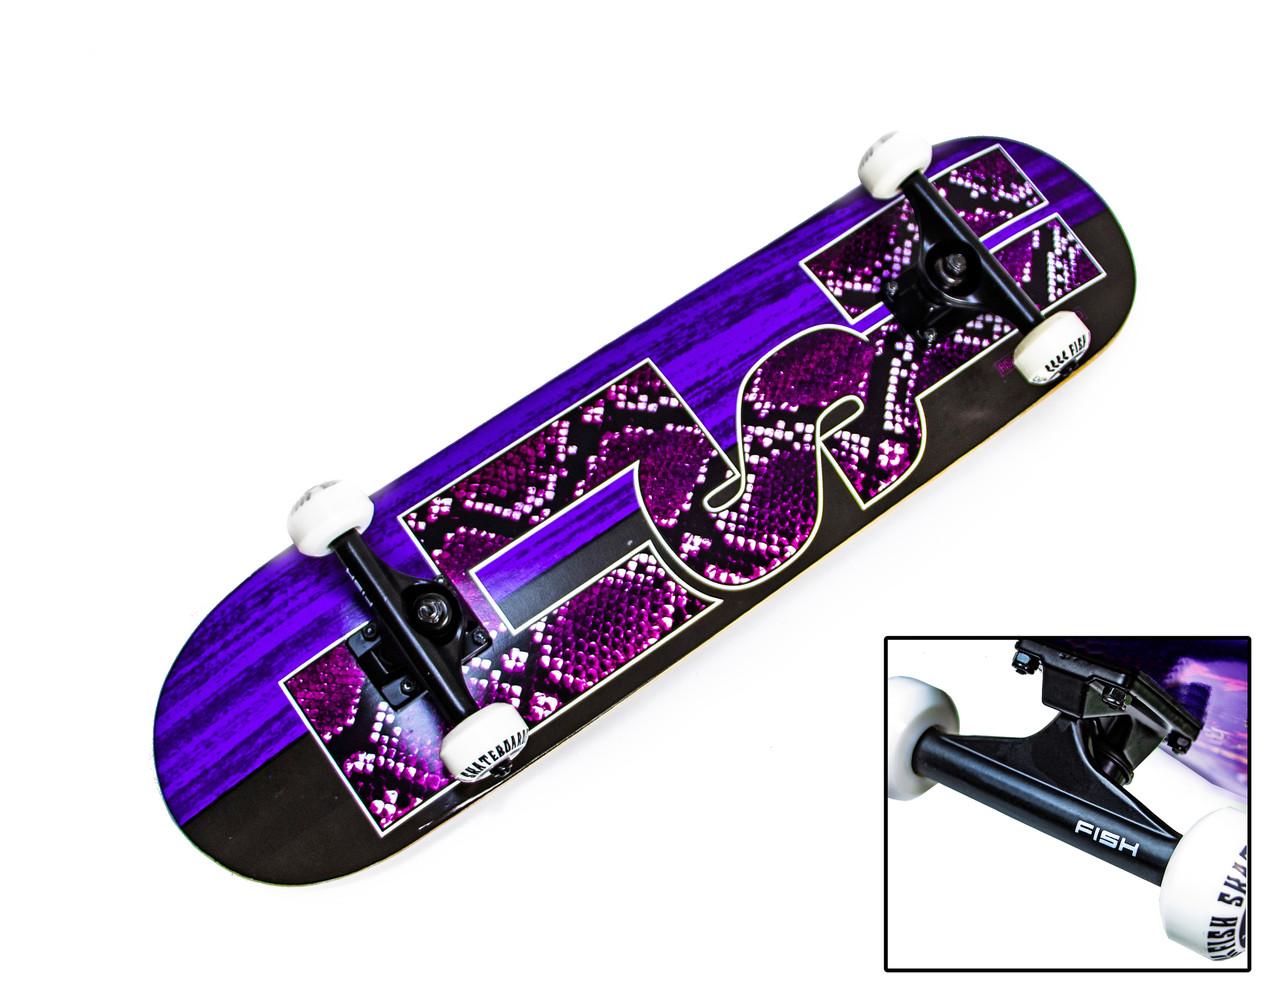 СкейтБорд деревянный от Fish Skateboard Snake Skin  (Польша)